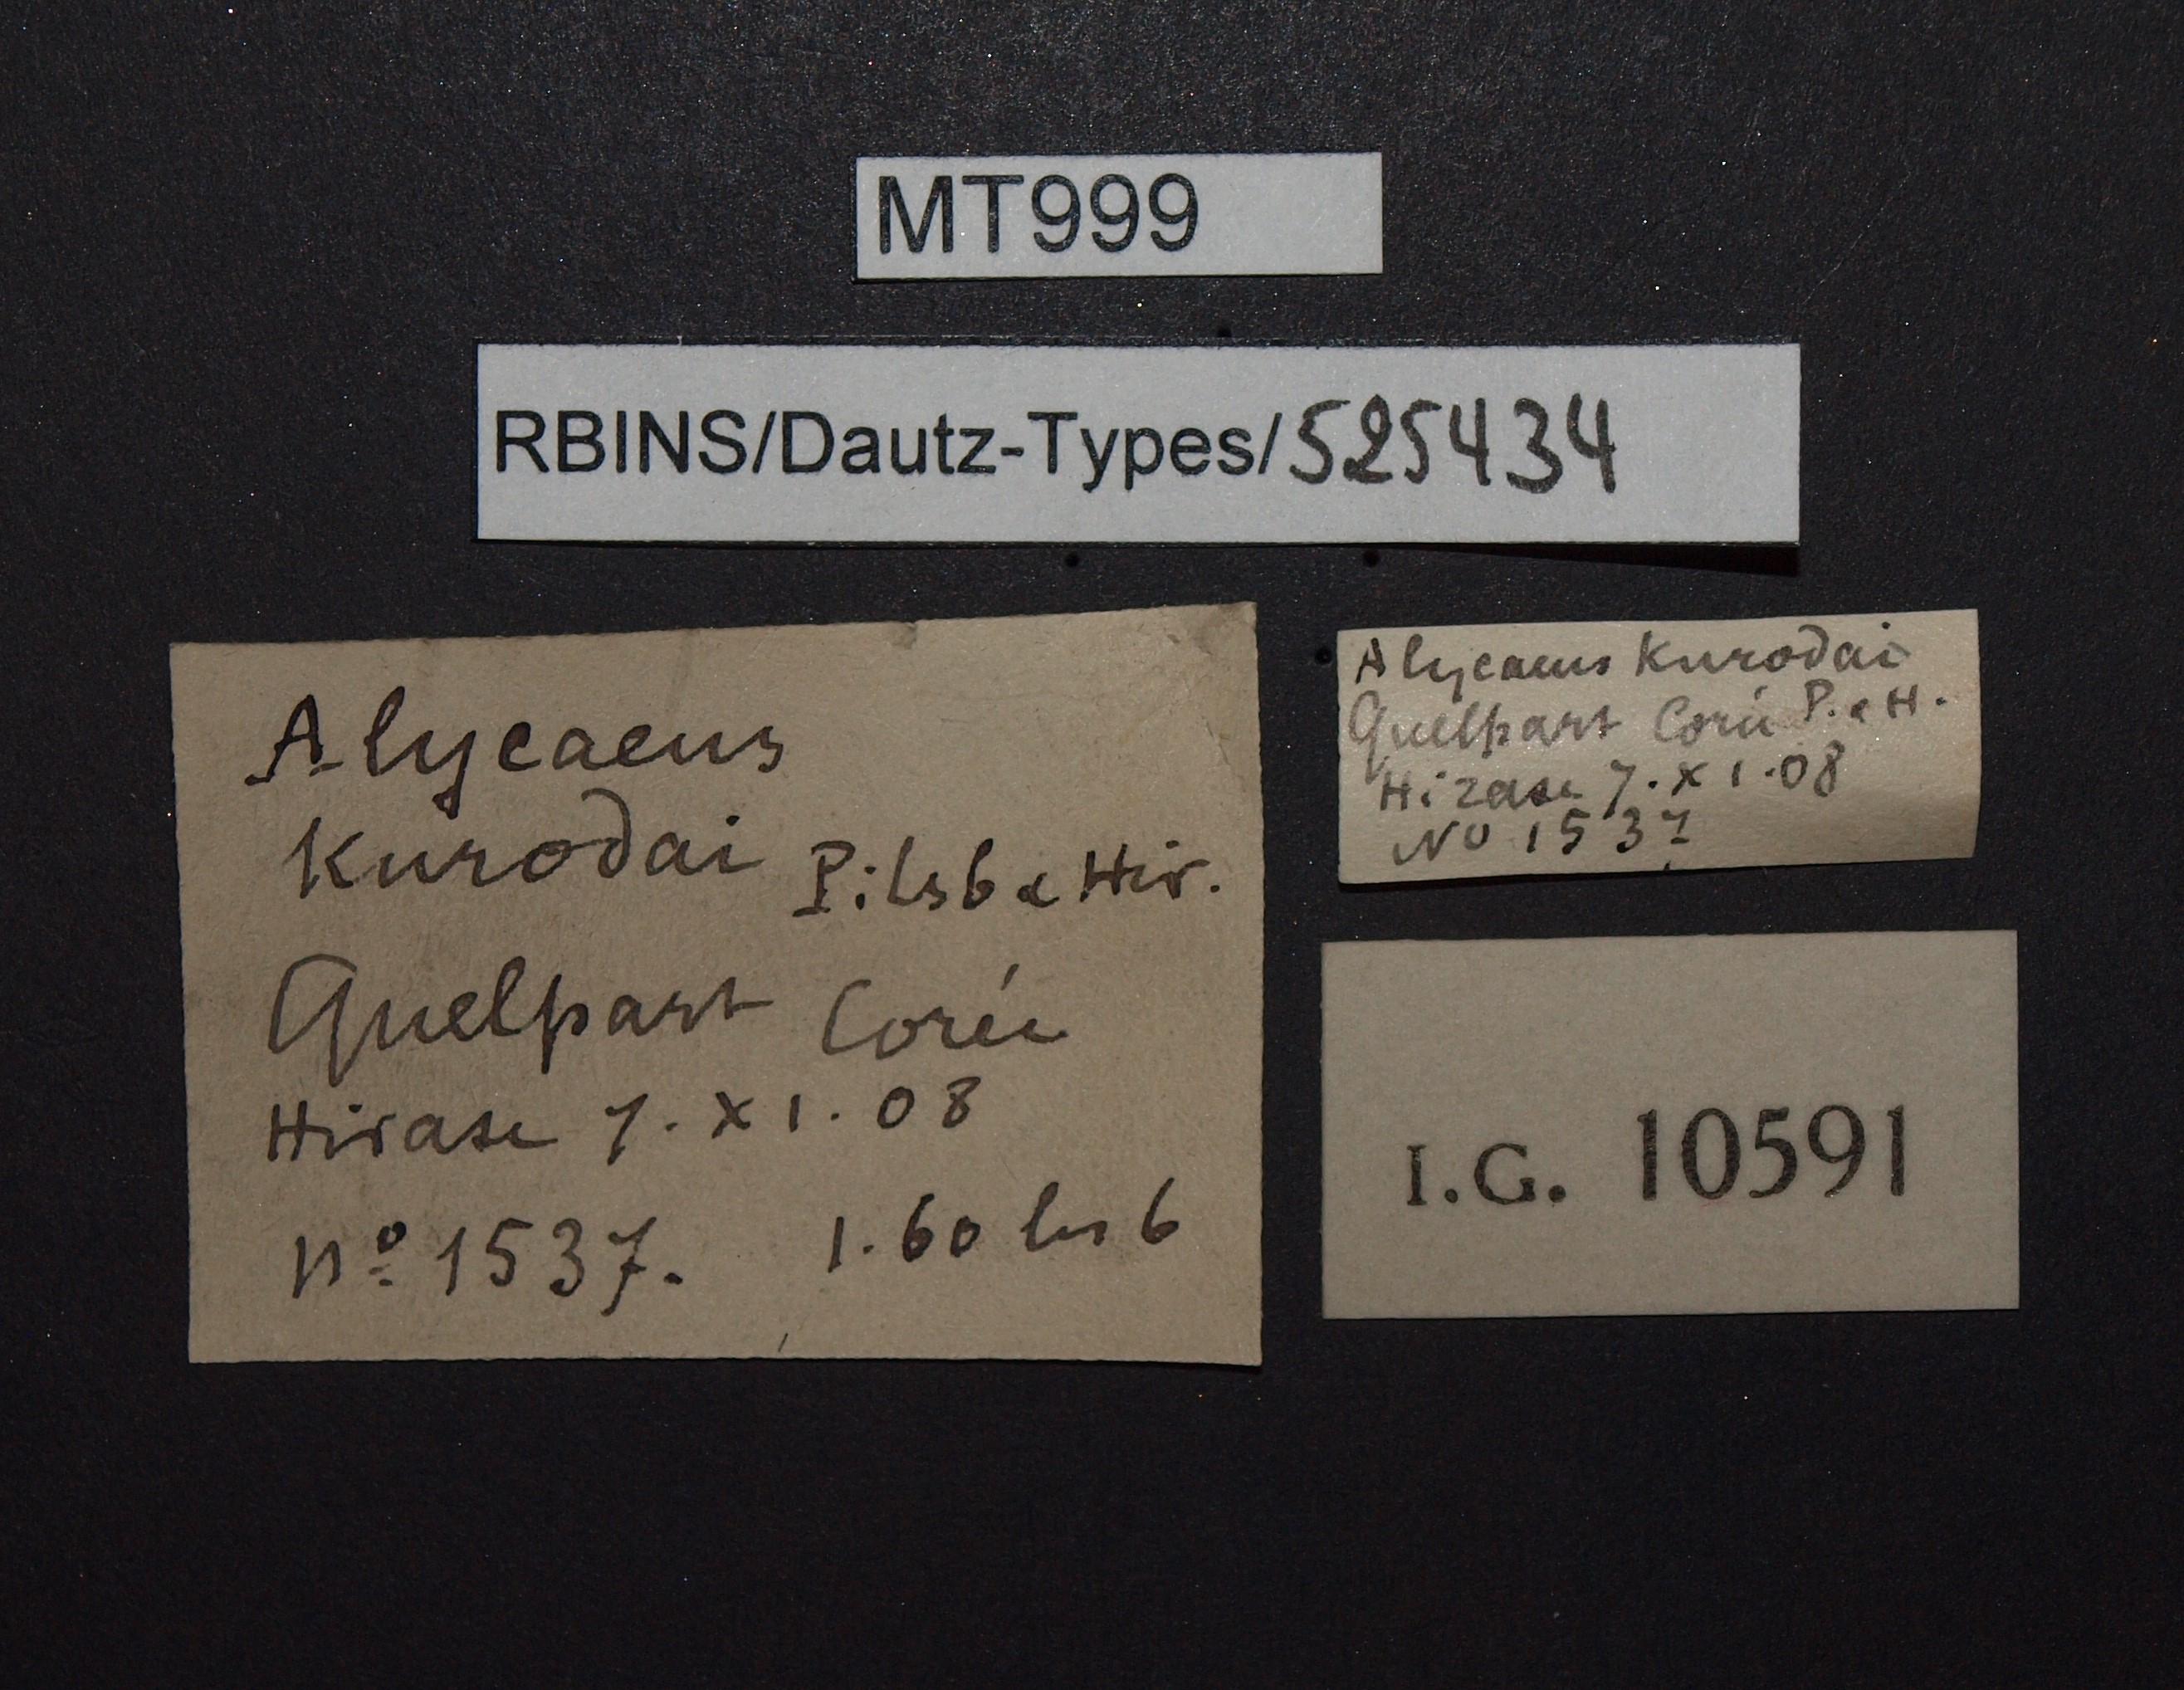 BE-RBINS-INV PARATYPE MT 999 Alycaeus kurodai LABELS.jpg